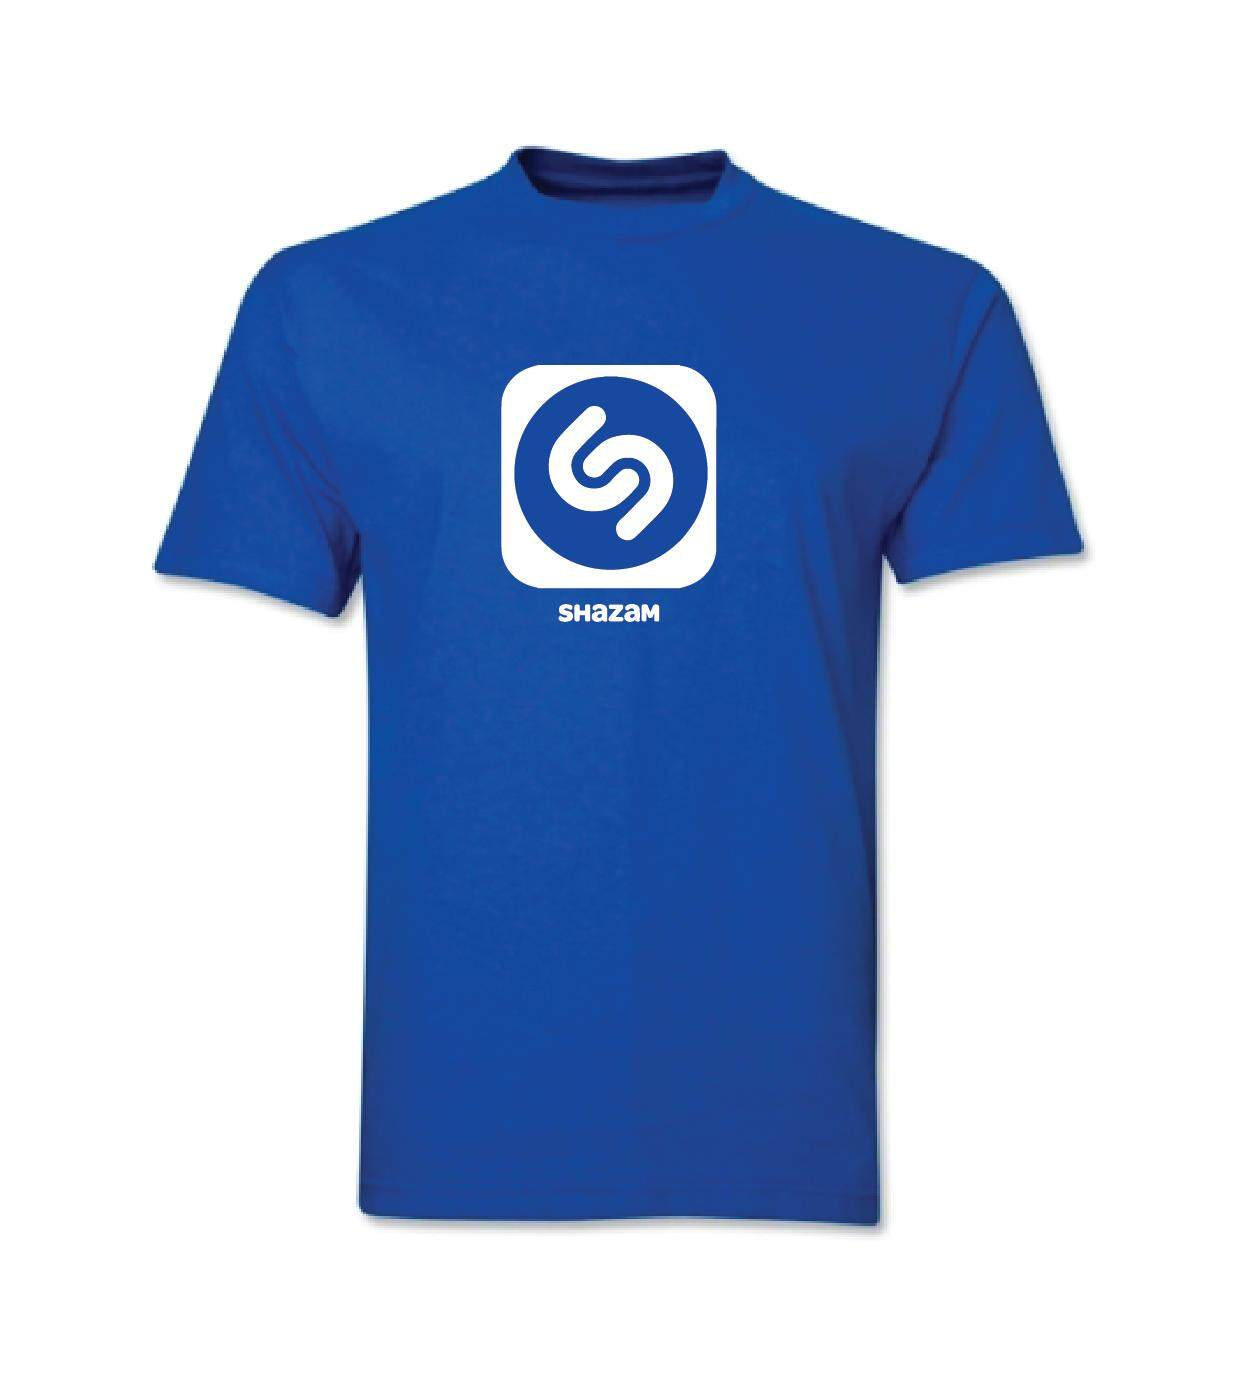 T-Shirt SHAZAM 100% Cotton Baju Tshirt Hitam Putih bossku